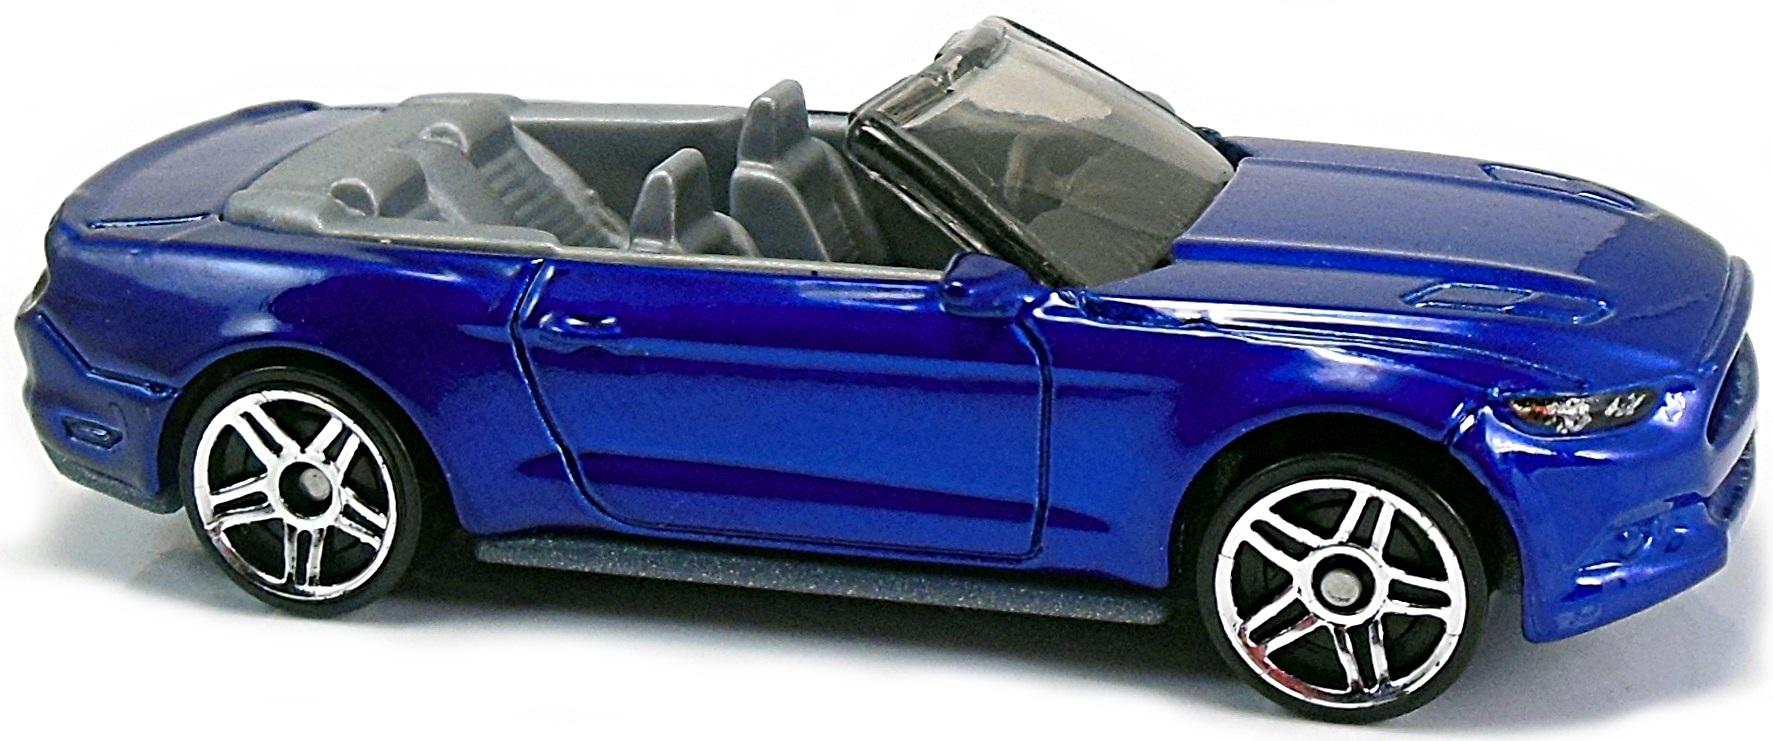 2015 ford mustang gt convertible 73mm 2017 hot wheels newsletter. Black Bedroom Furniture Sets. Home Design Ideas